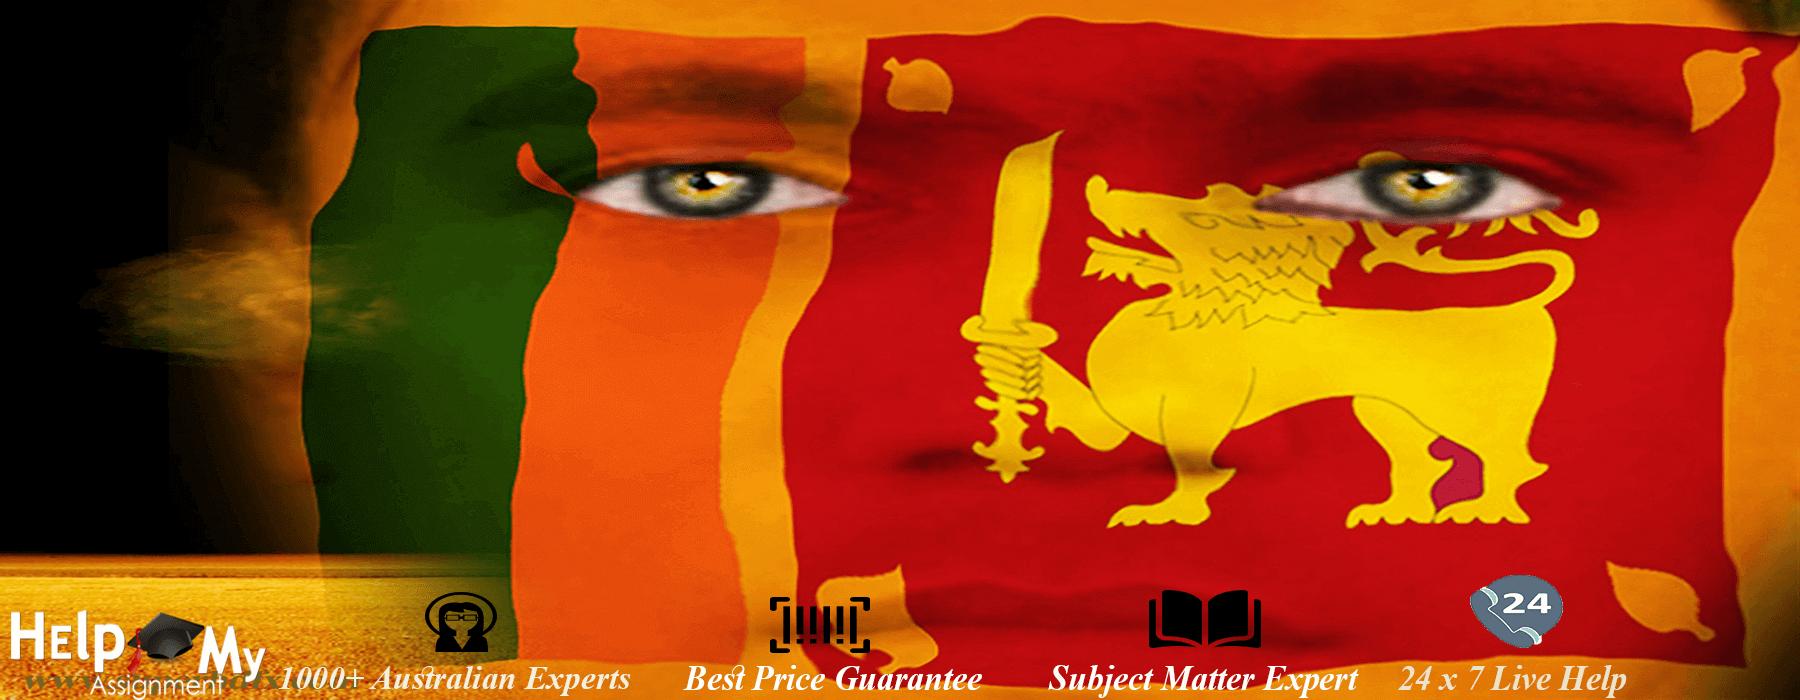 Sri Lanka Assignment Help